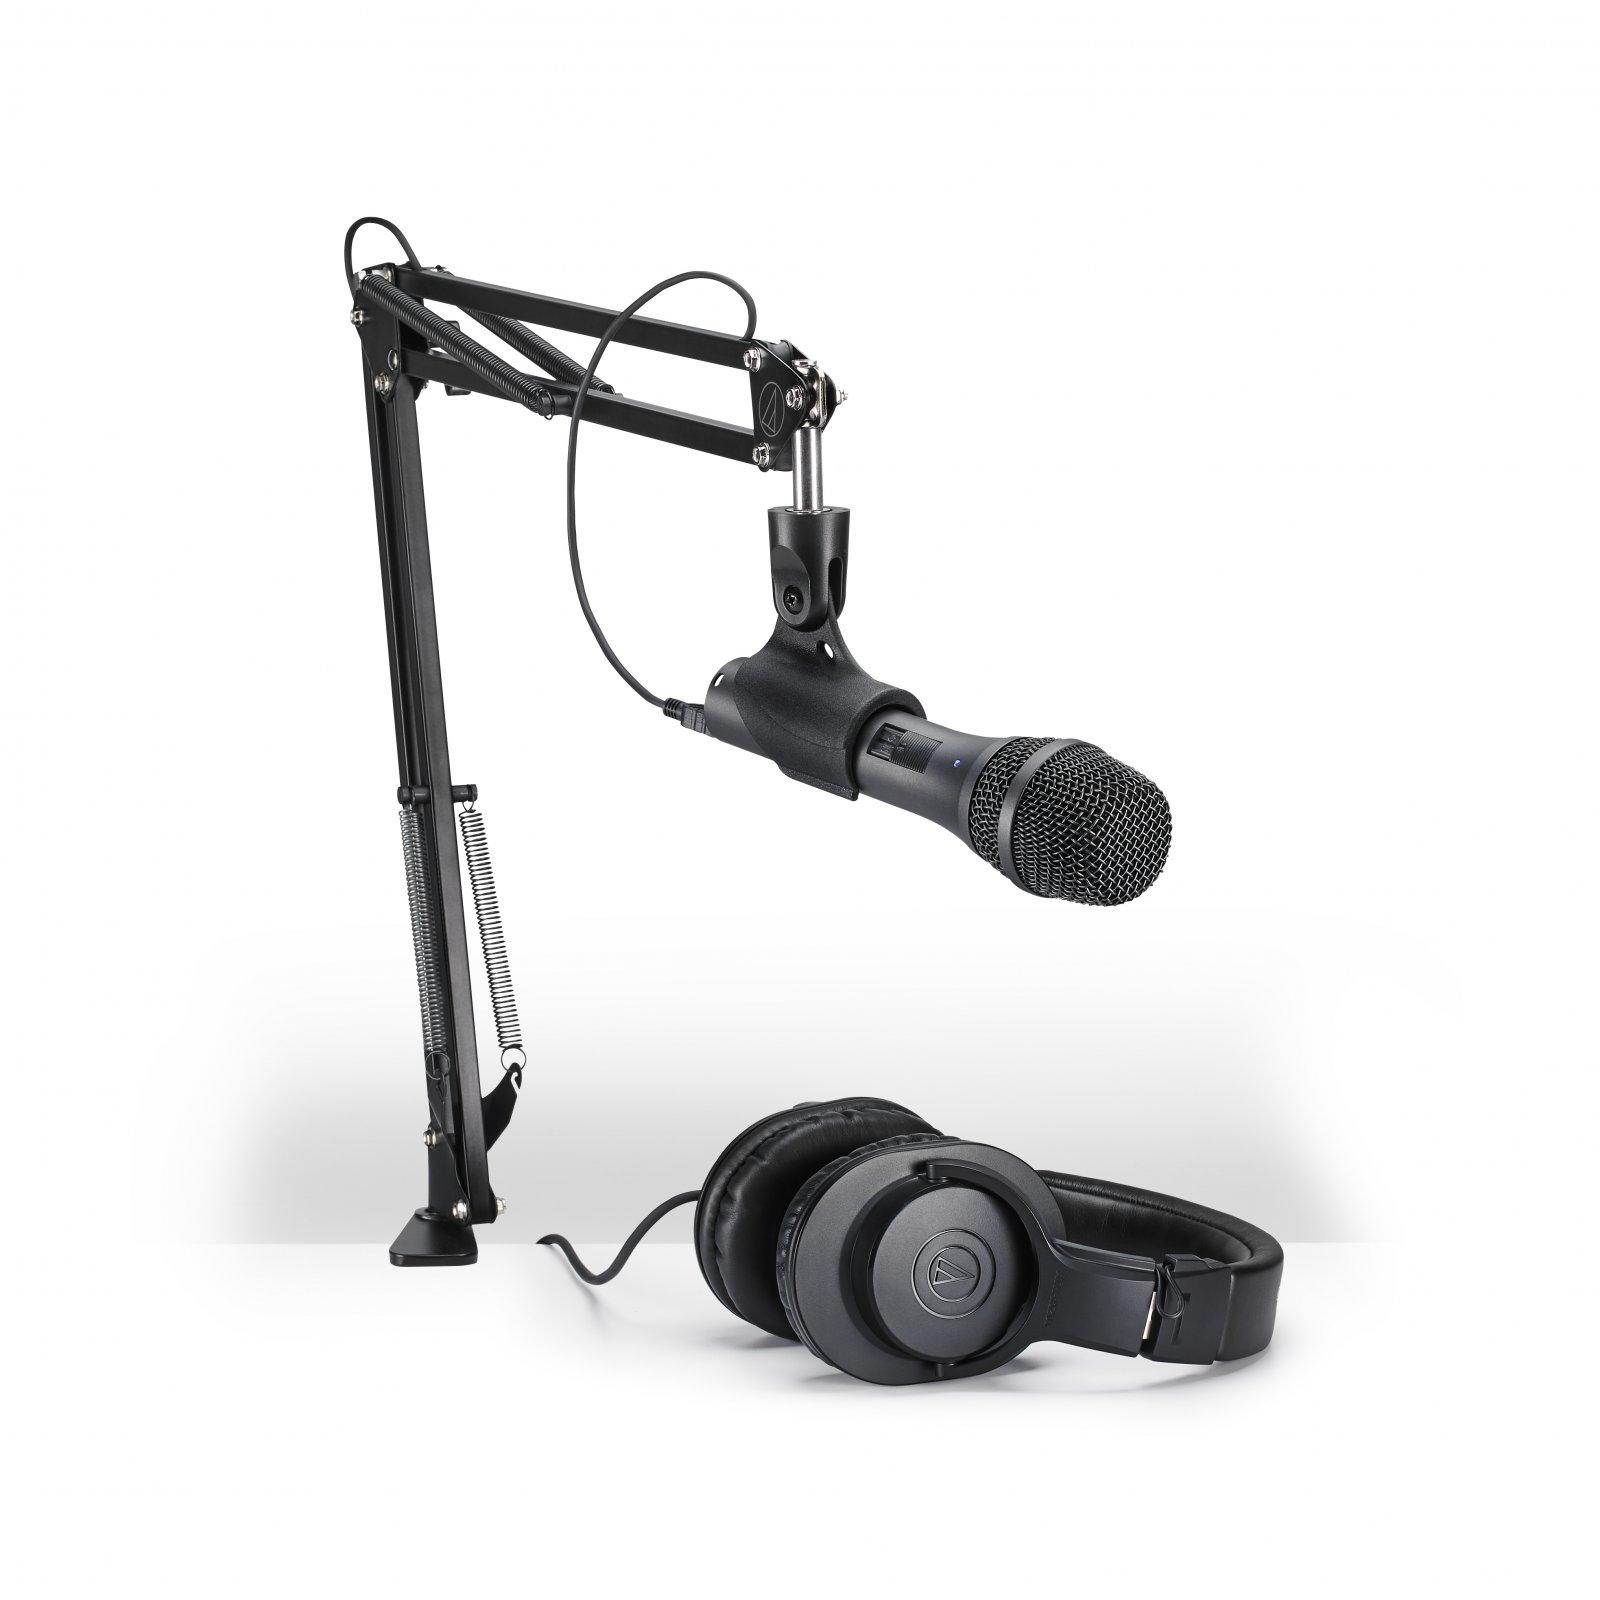 Audio-Technica AT2005USB Studio Pack USB Mic Pack